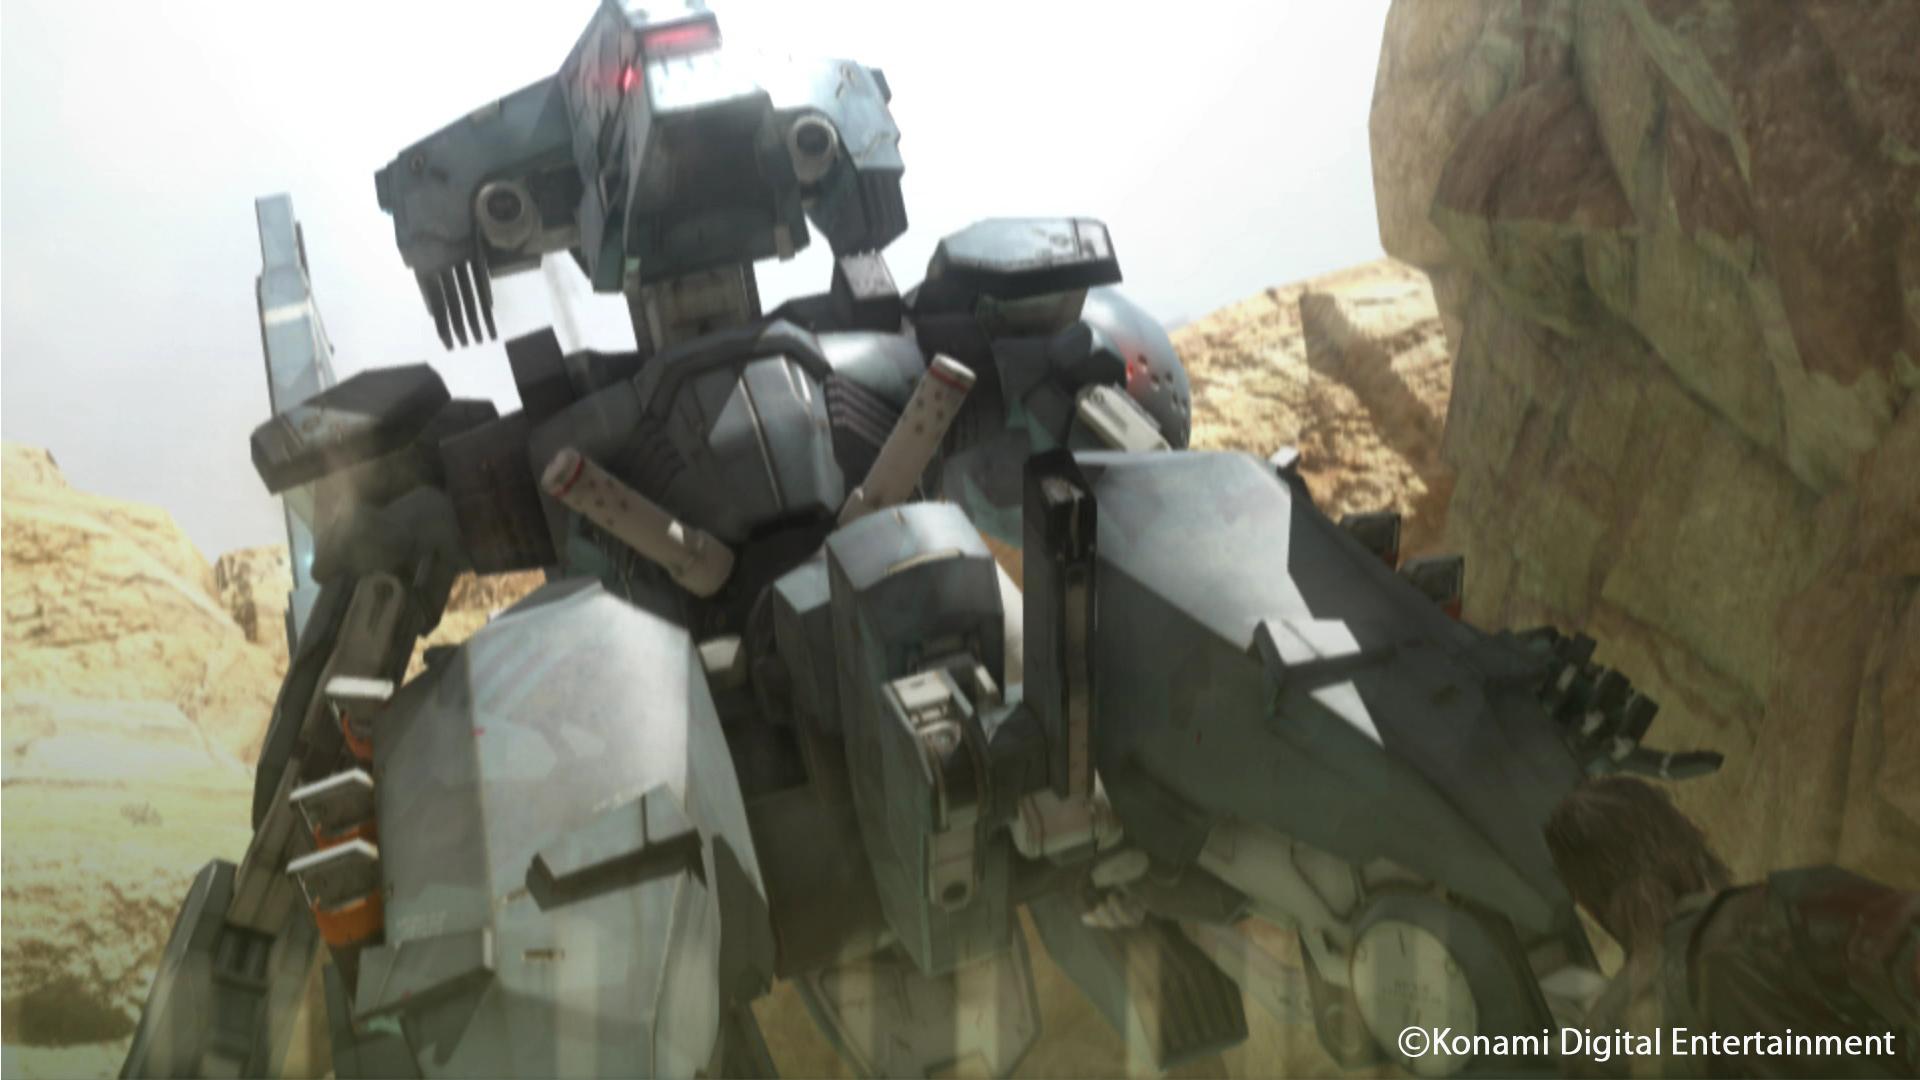 Metal Gear Solid V: The Phantom Pain – Wikipedia